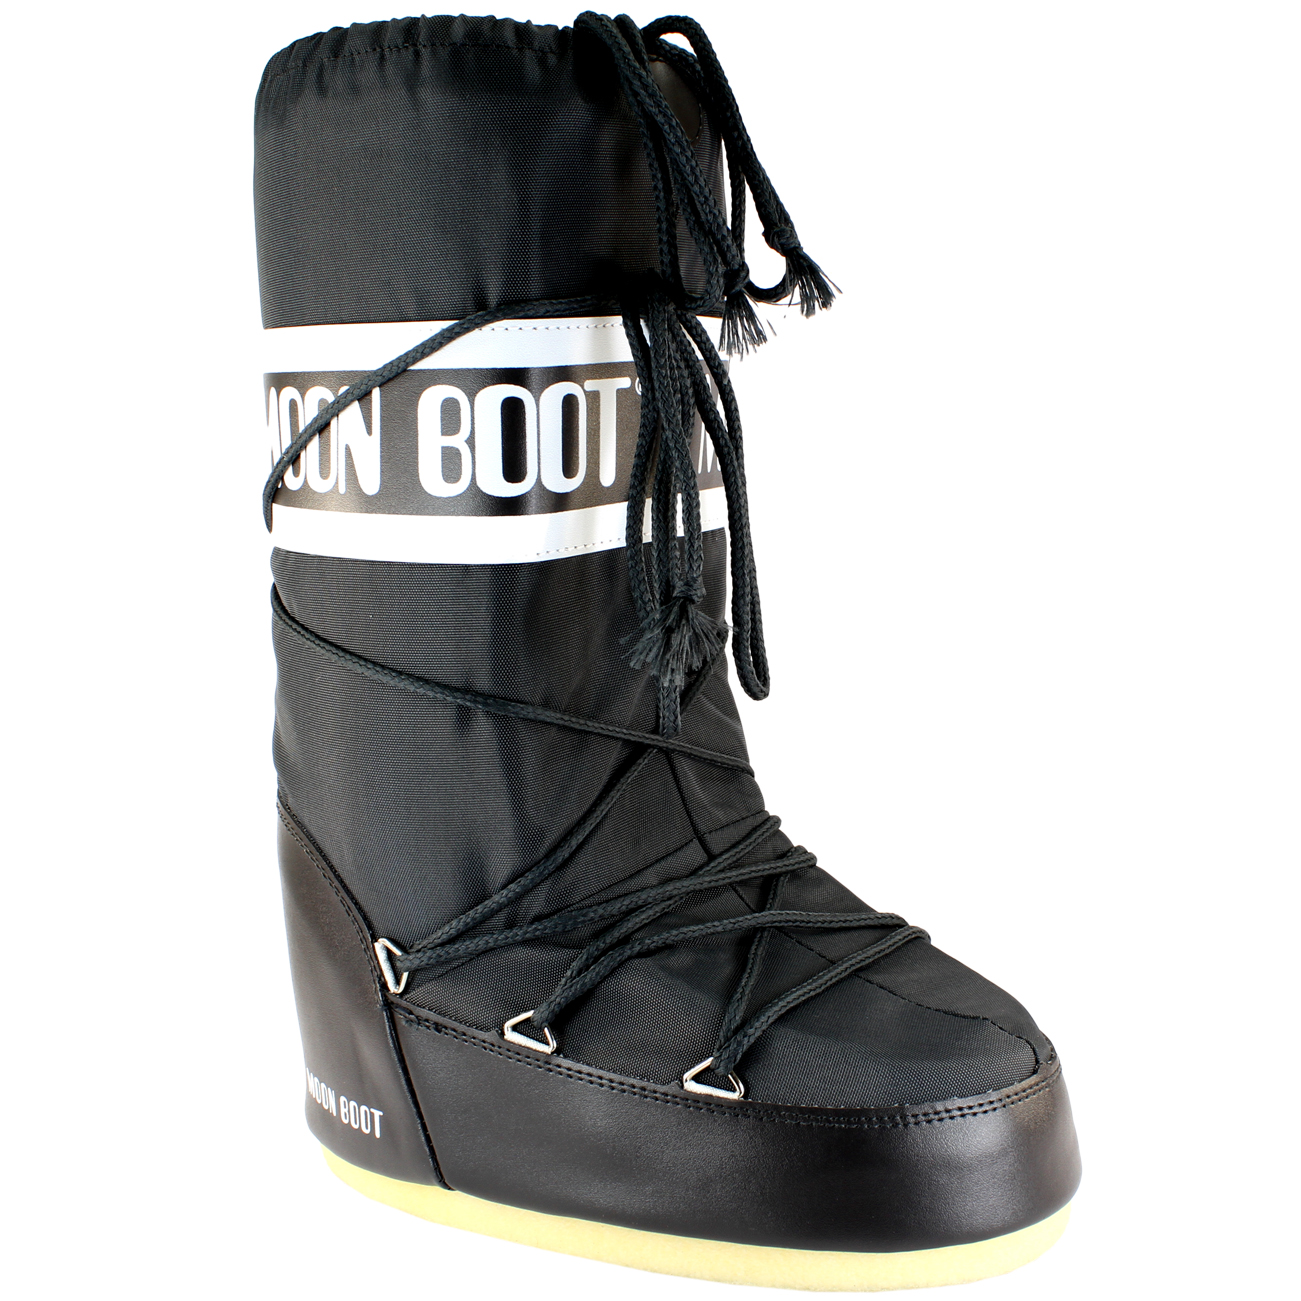 Mens Tecnica Moon Boot Nylon Mid Calf Waterproof Winter